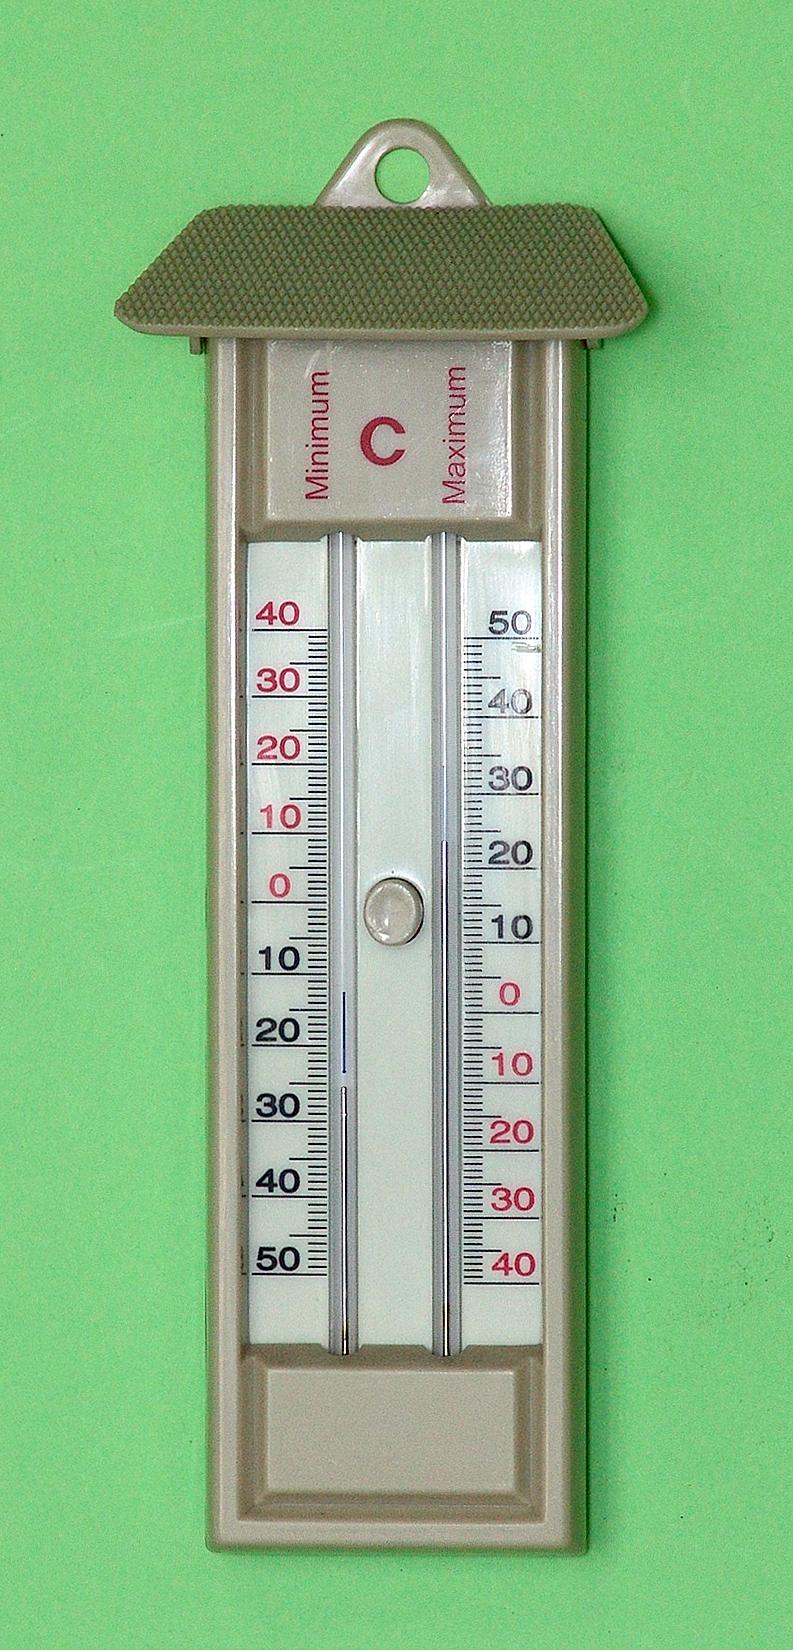 globe globe maximum minimum thermometer education equipment che scientific co hong. Black Bedroom Furniture Sets. Home Design Ideas